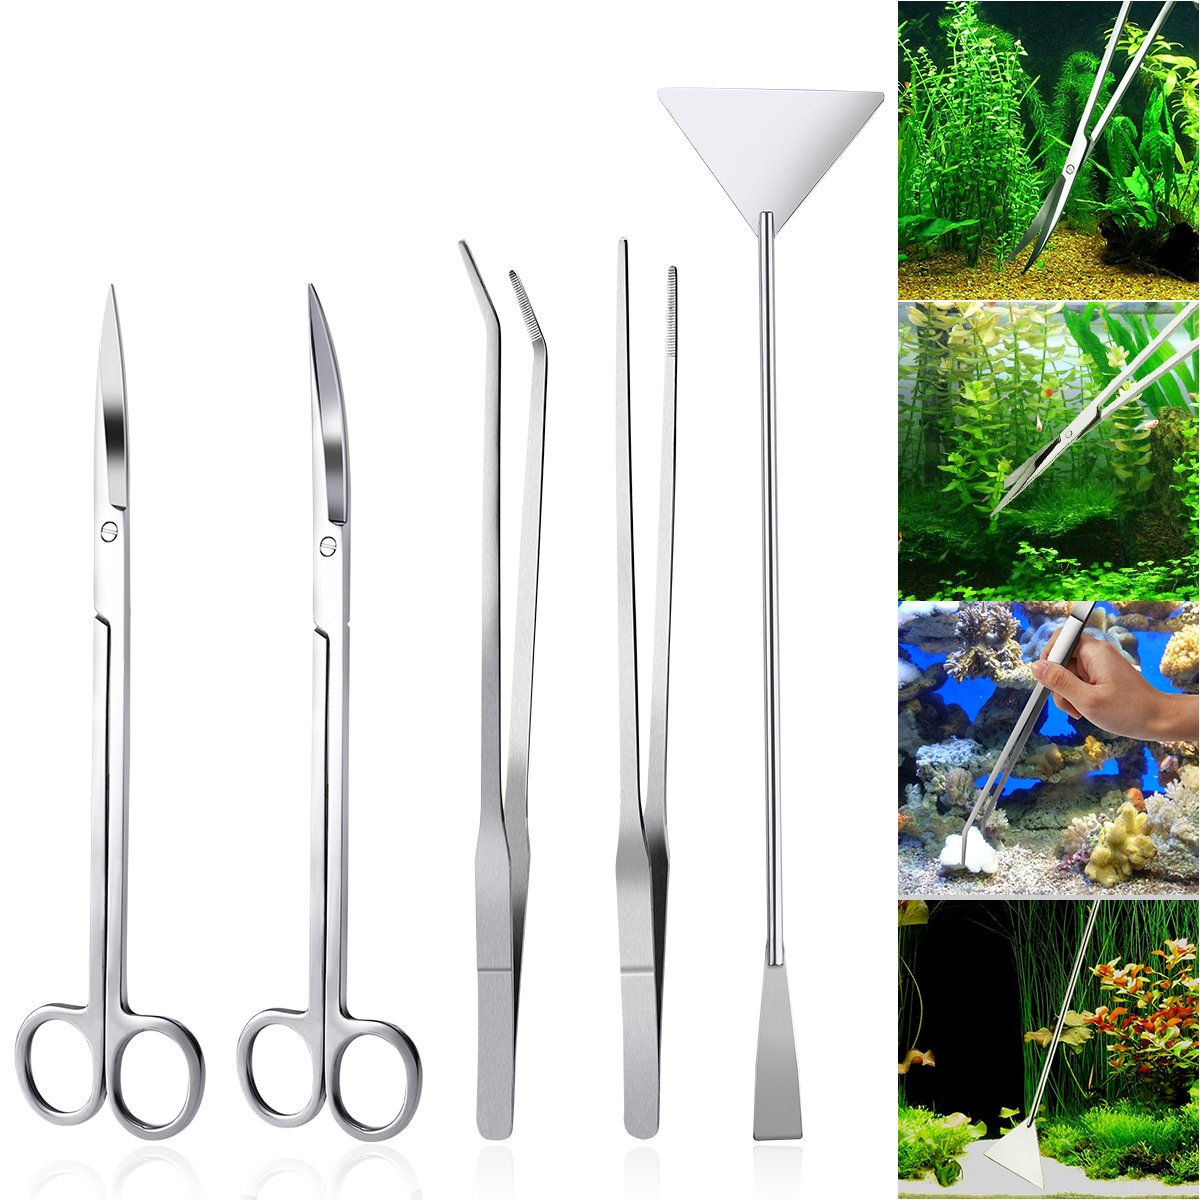 UEETEK Aquarium Aquascaping Kit 5 en 1 inox Aquarium Tank plante aquatique outils ensembles pinces ciseaux spatule product image